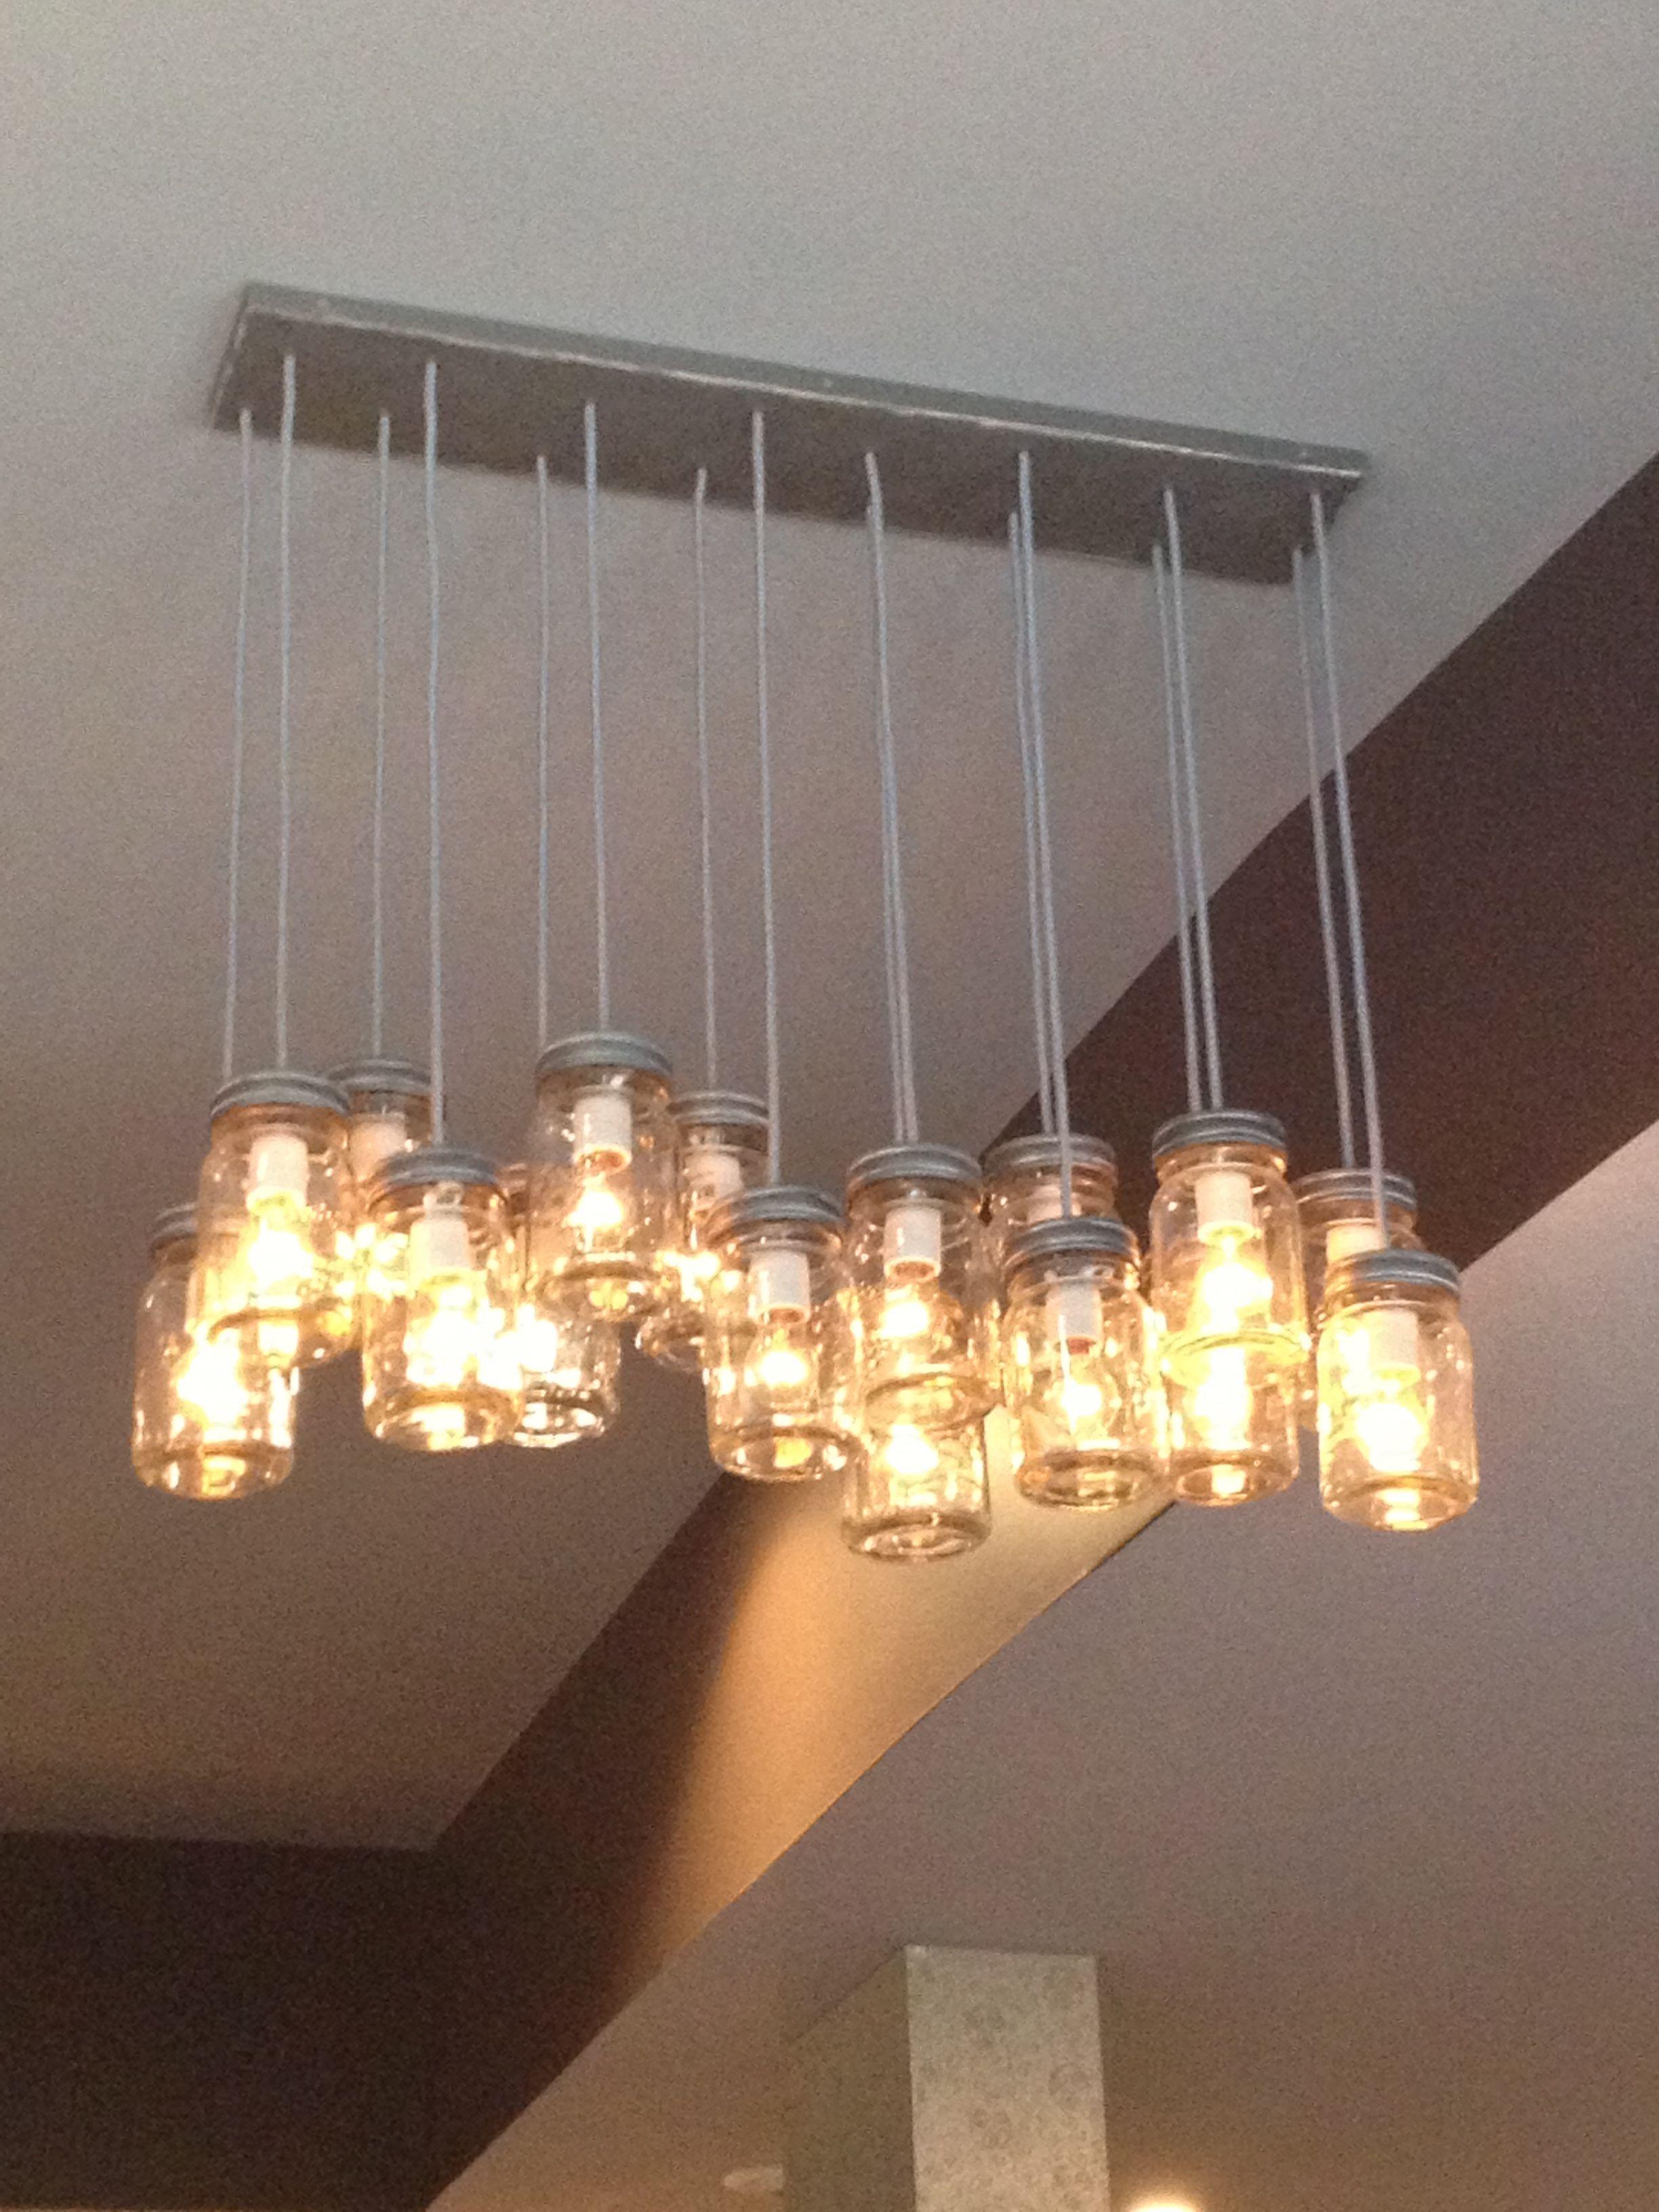 mason jar light fixture so cool kitchen dinning pinterest. Black Bedroom Furniture Sets. Home Design Ideas